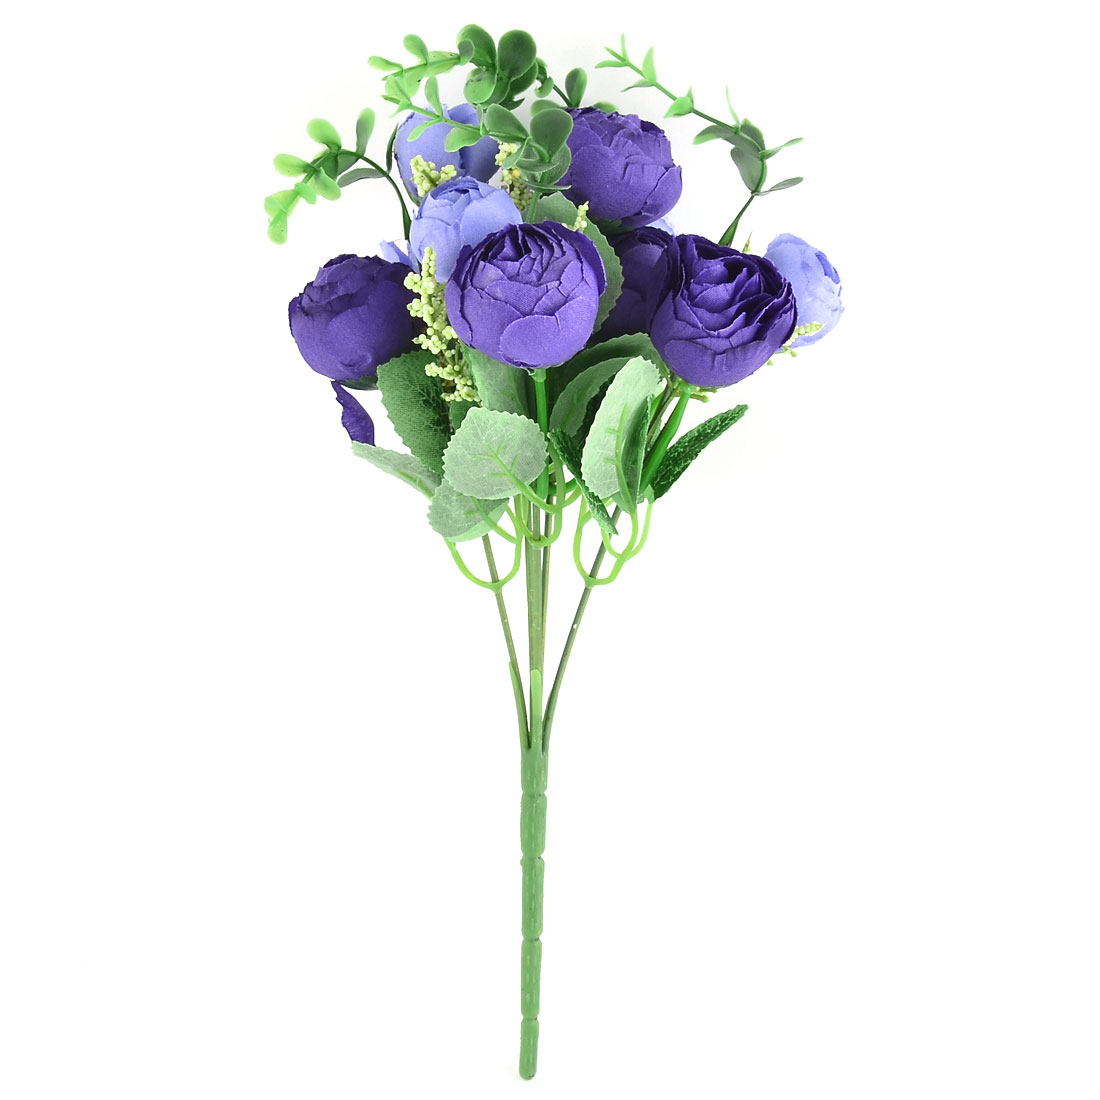 Wedding Banquet Decor 10 Heads Camellia Bud Artificial Bouquet Navy Blue